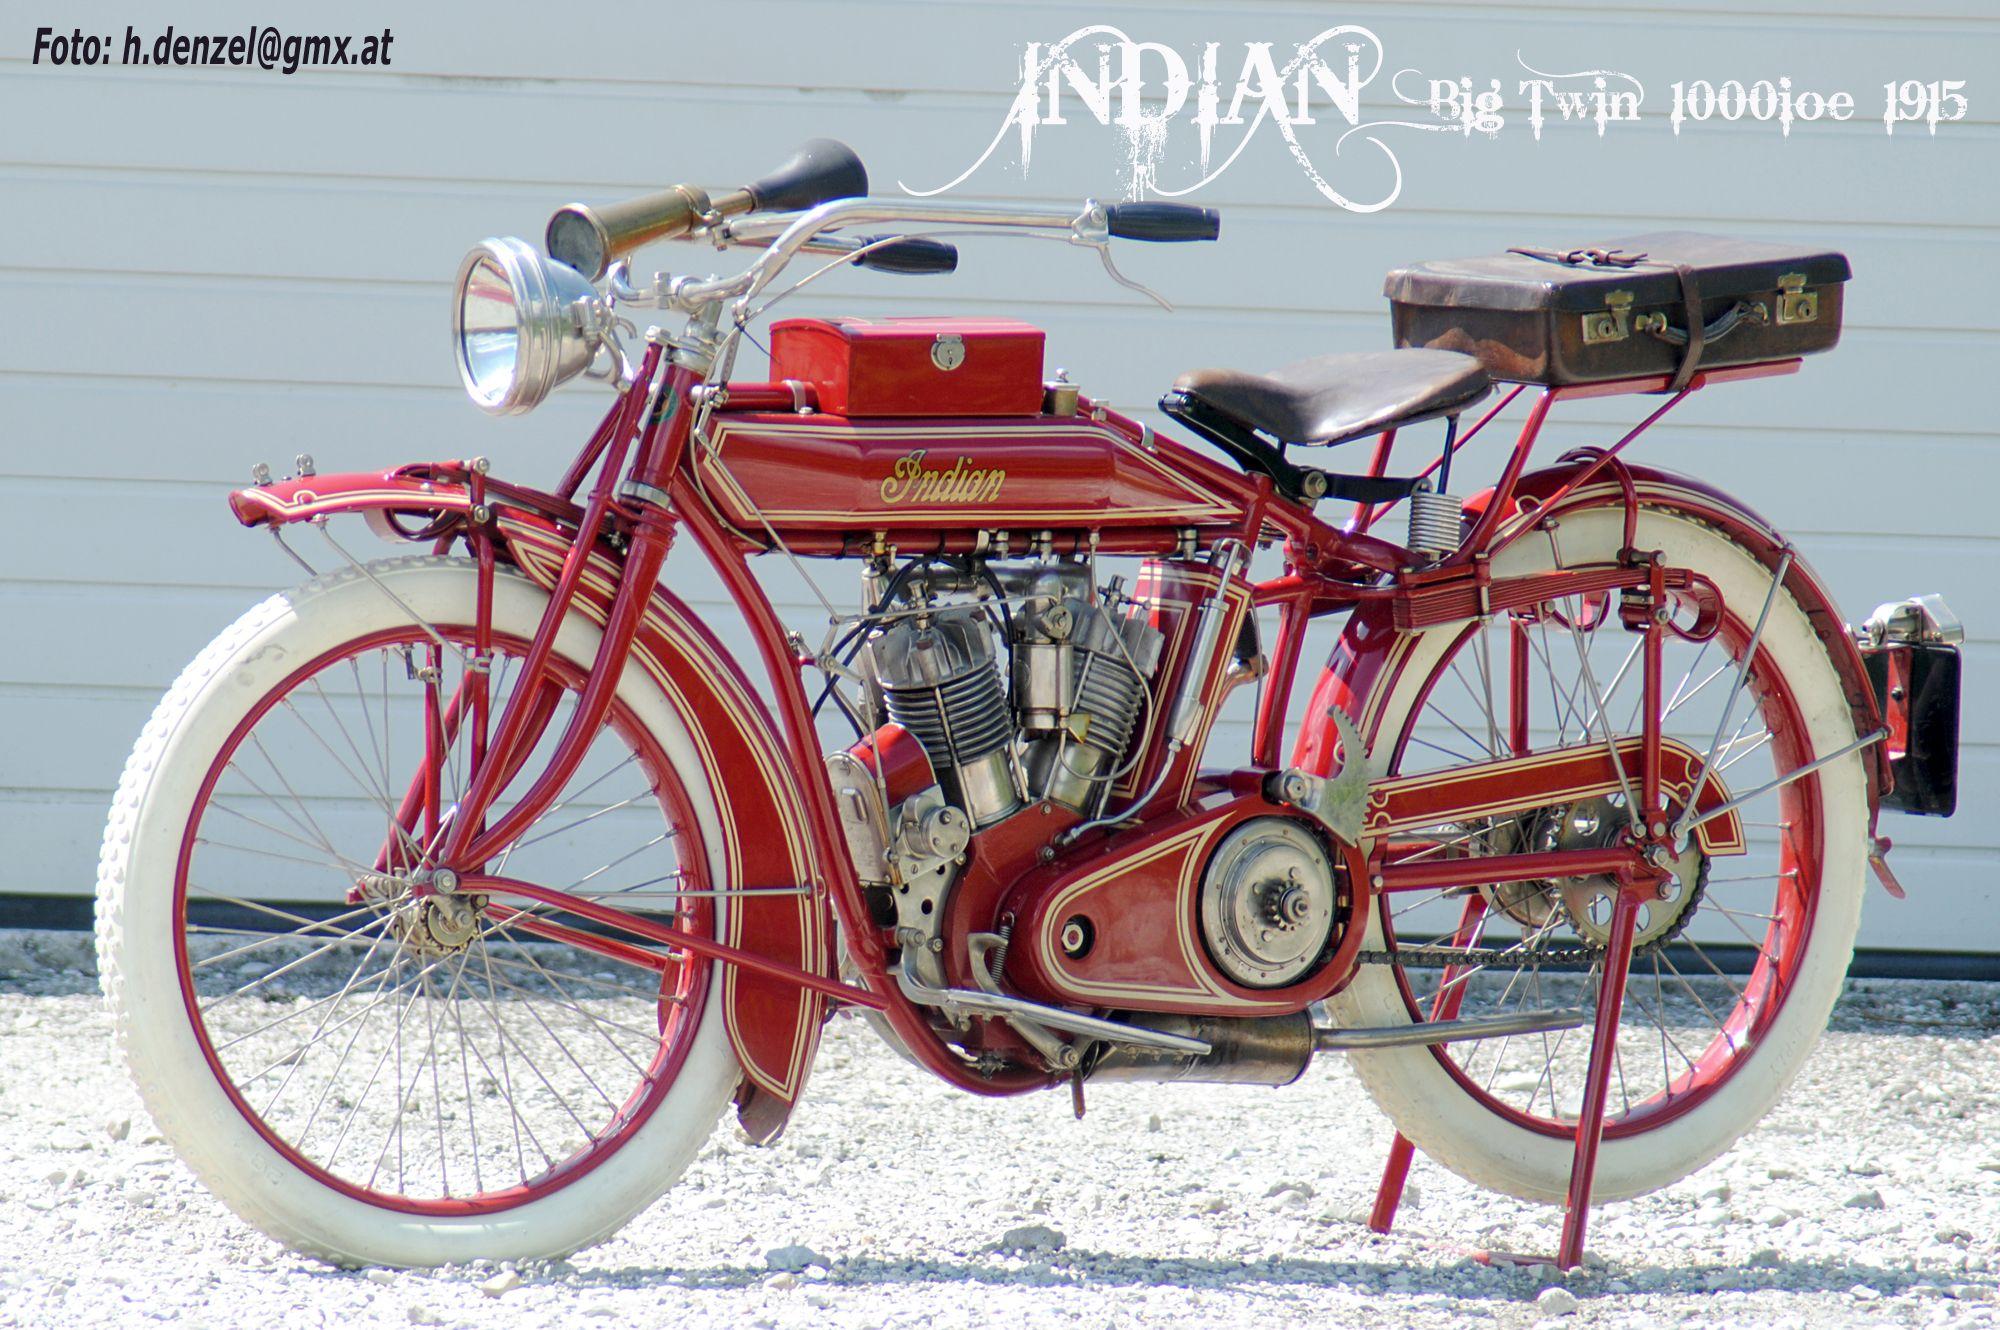 Indian Big Twin 1000ioe 1915